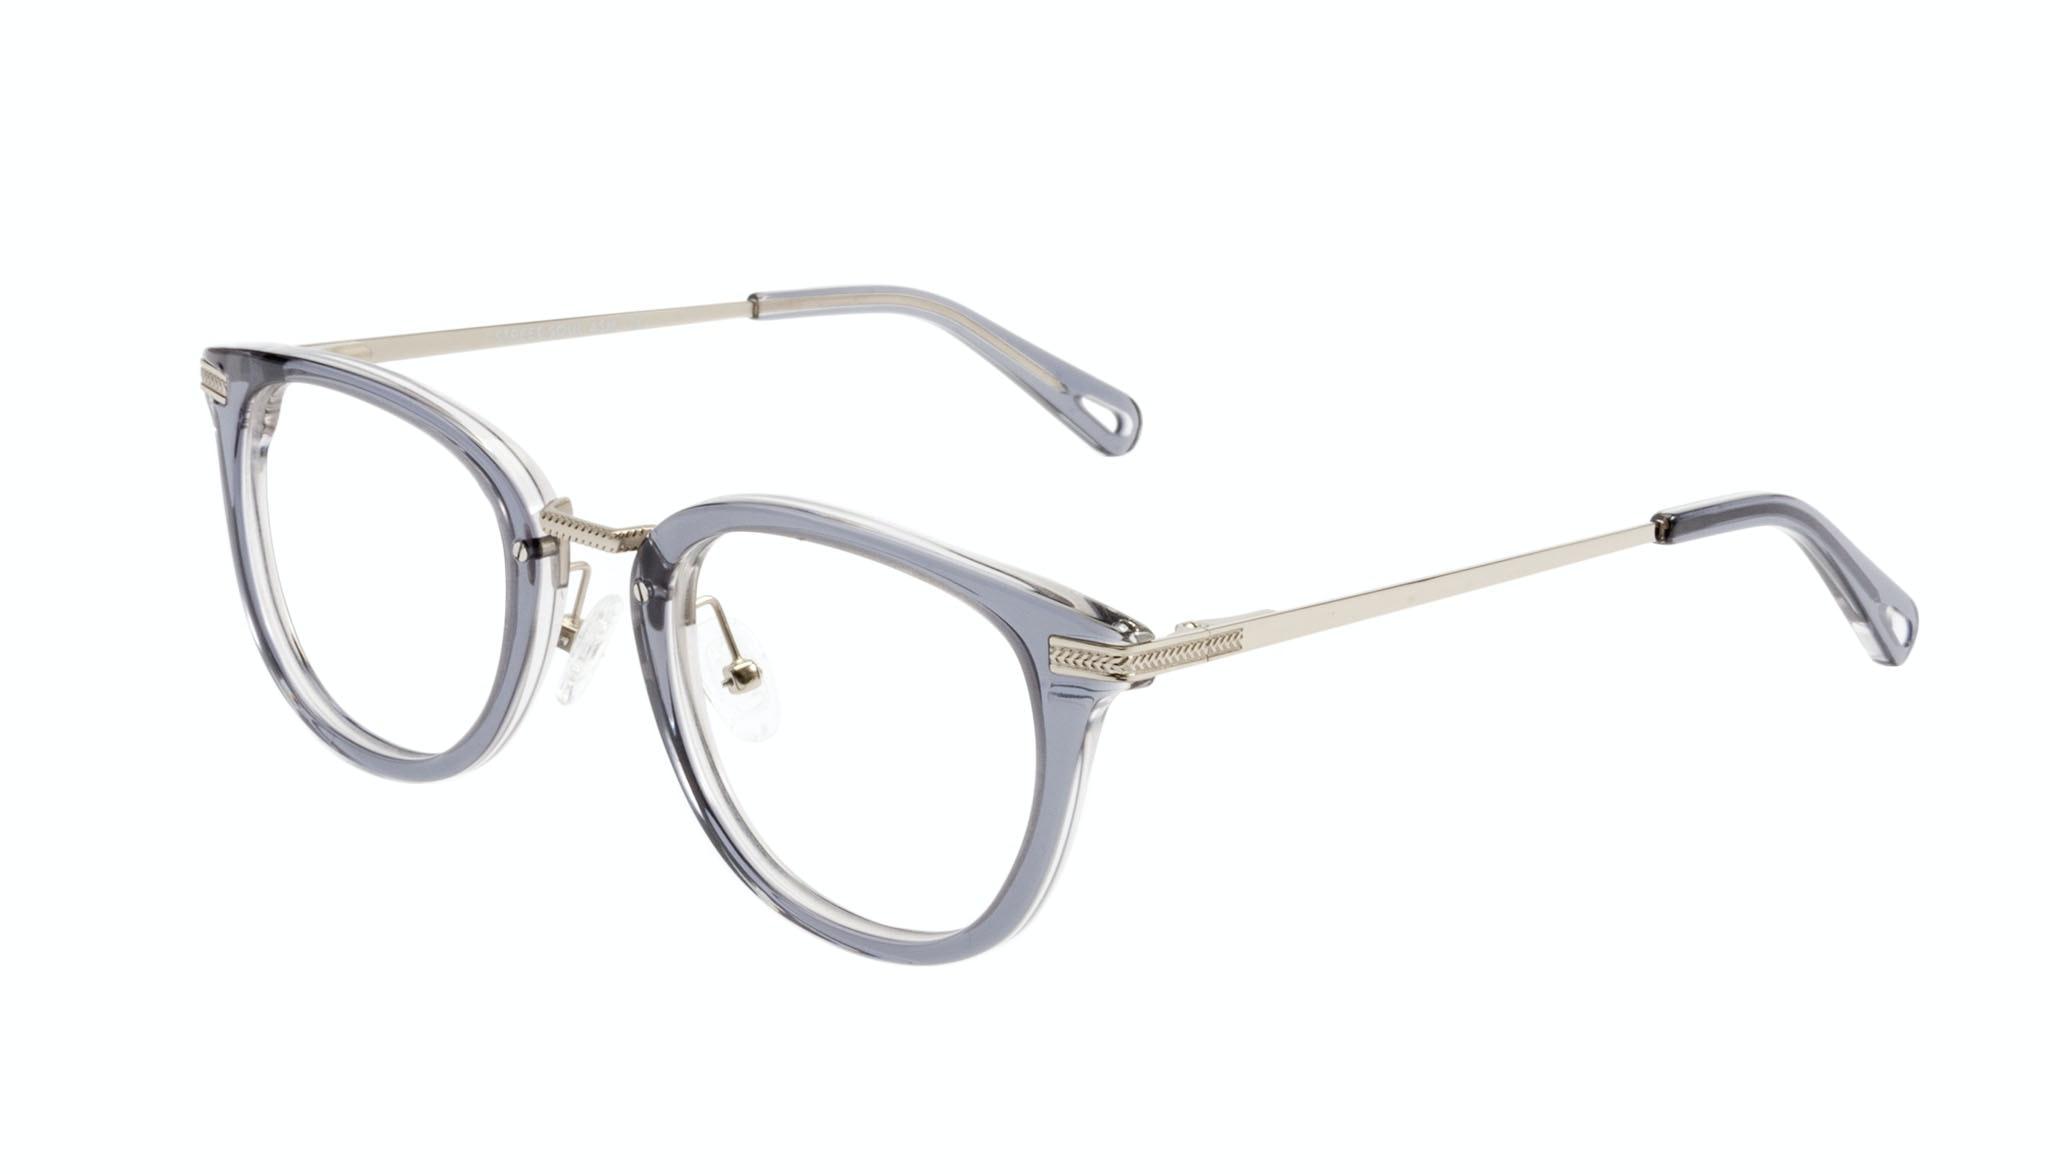 Affordable Fashion Glasses Rectangle Square Eyeglasses Men Street Soul Ash Tilt